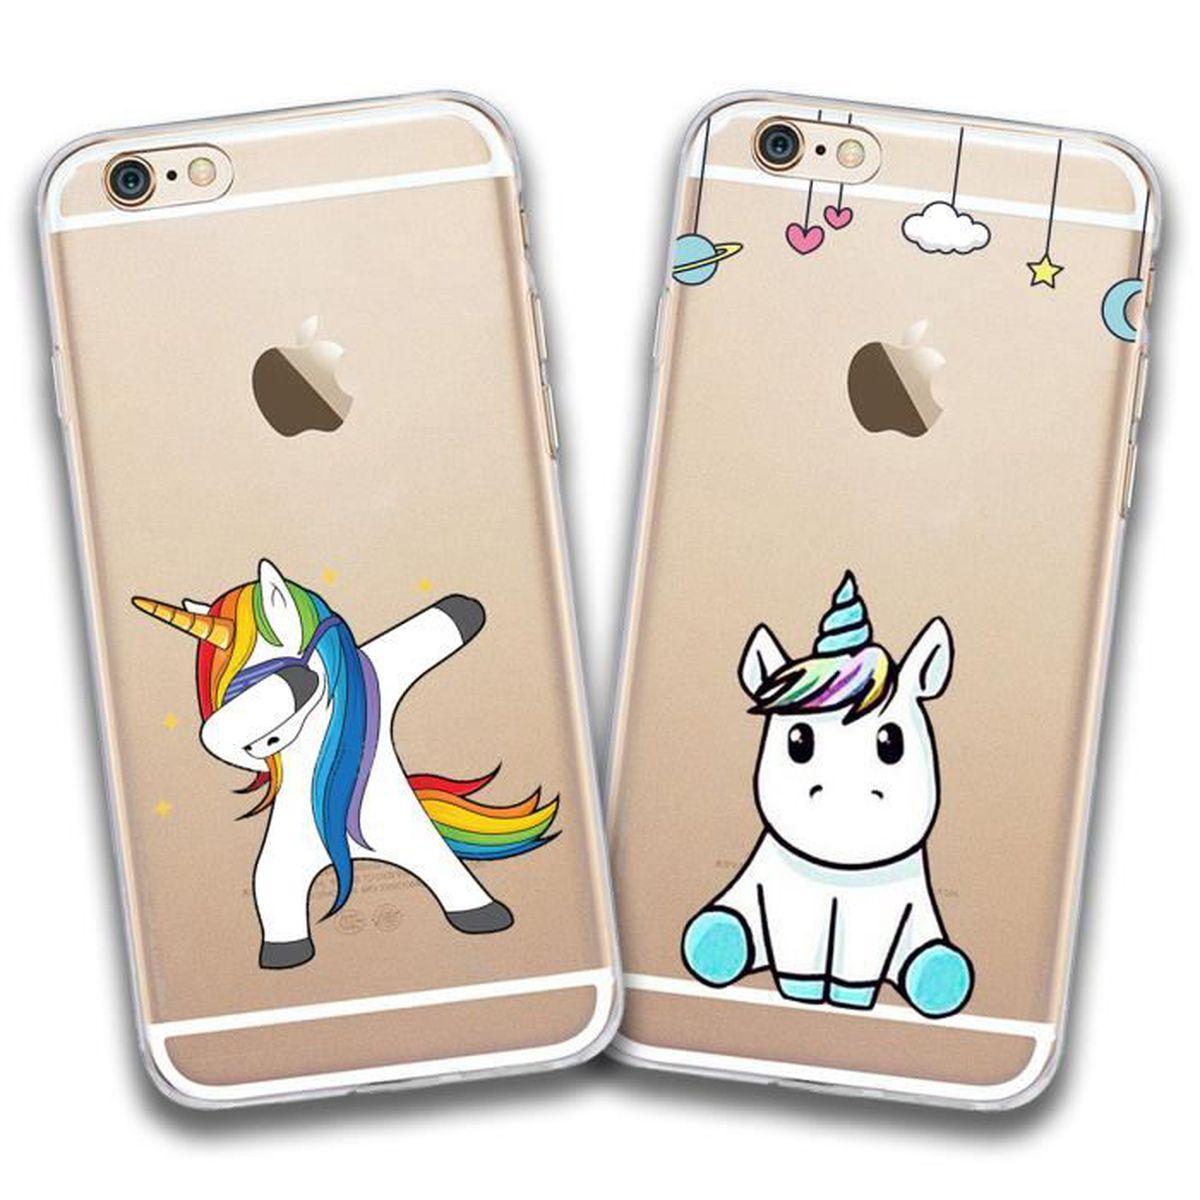 2 X Coque iPhone 6/6s, Licorne Licorne Doux Souple Transparent ...